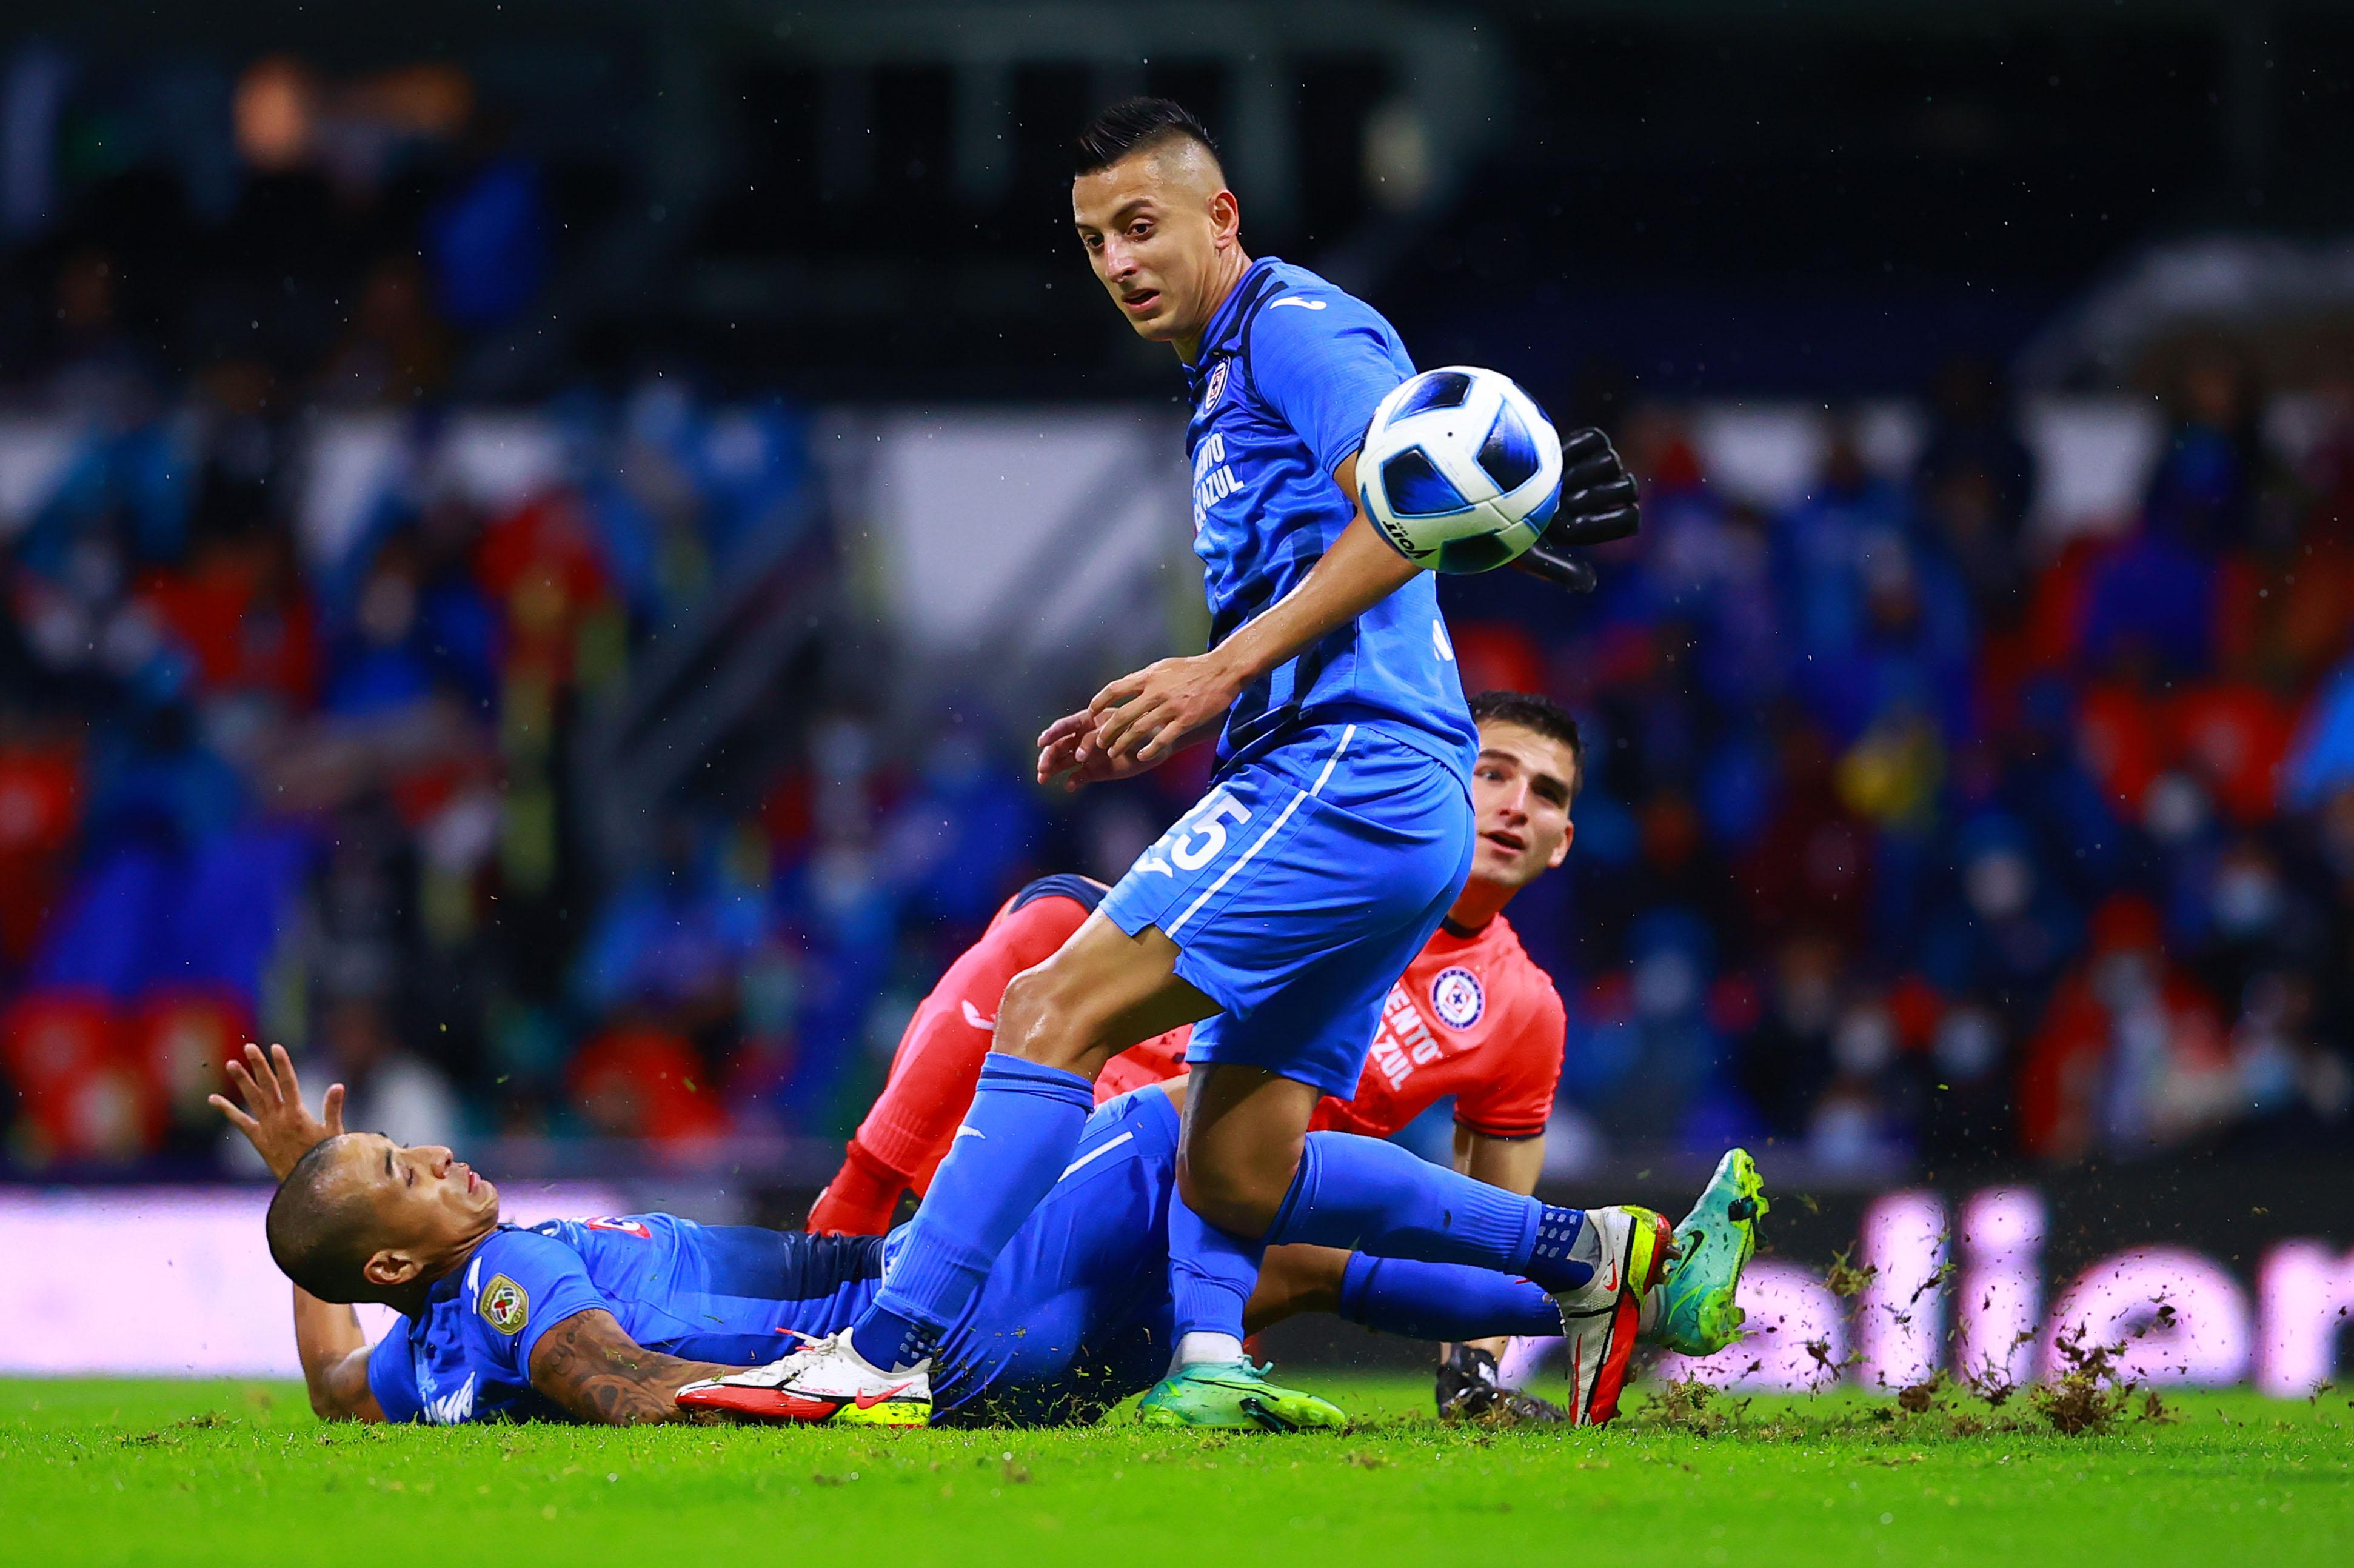 Cruz Azul vs Pachuca 1-1 Torneo Apertura 2021